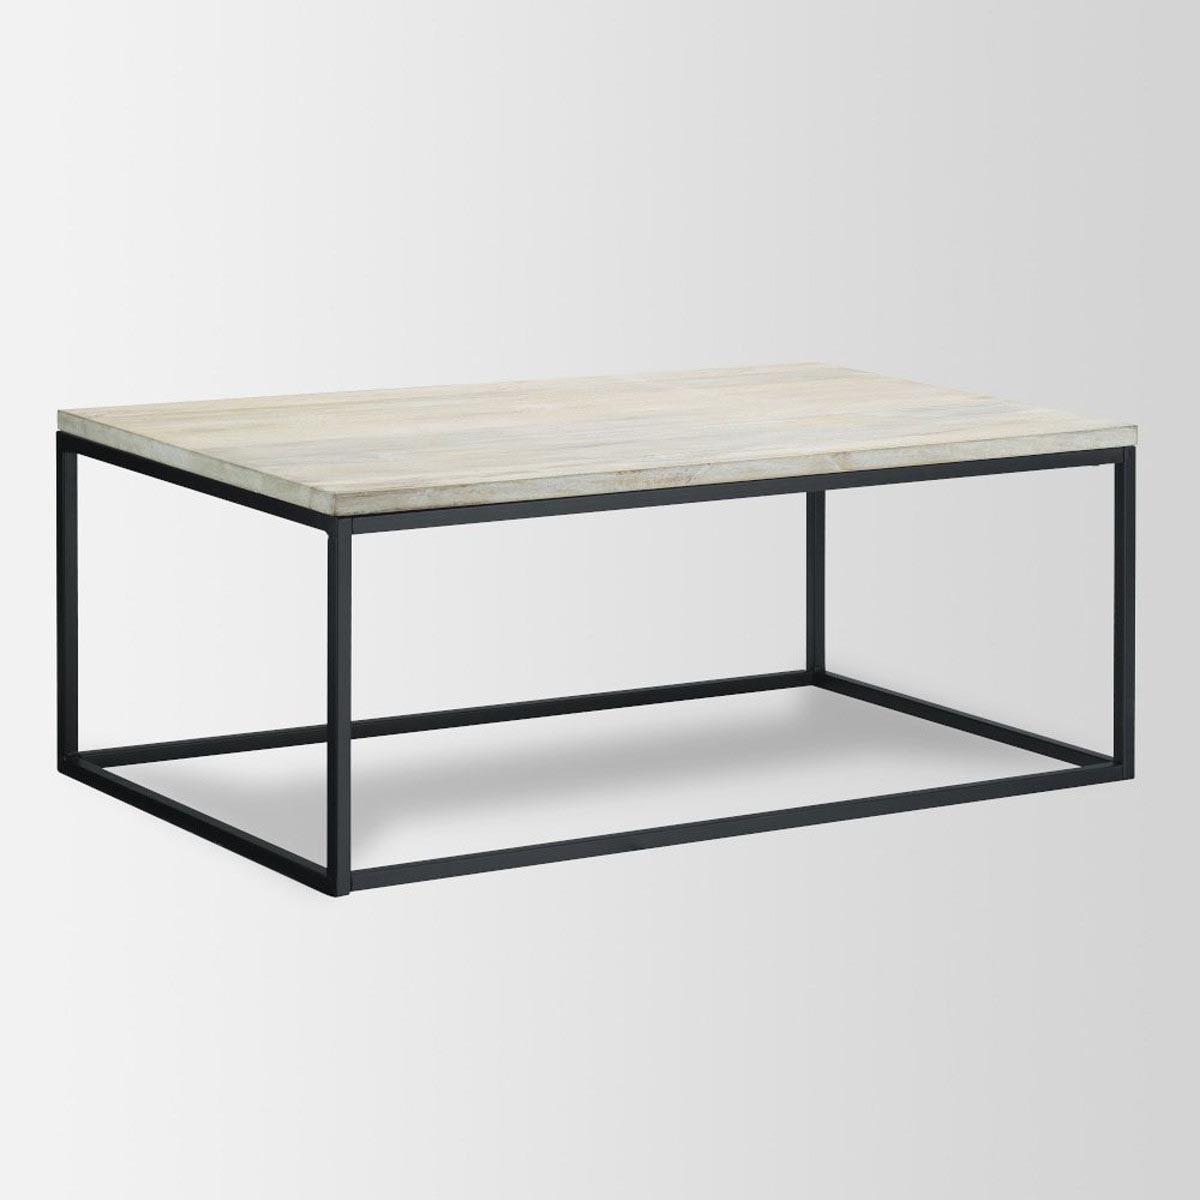 Steel Frame Coffee Table | Coffee Table Design Ideas